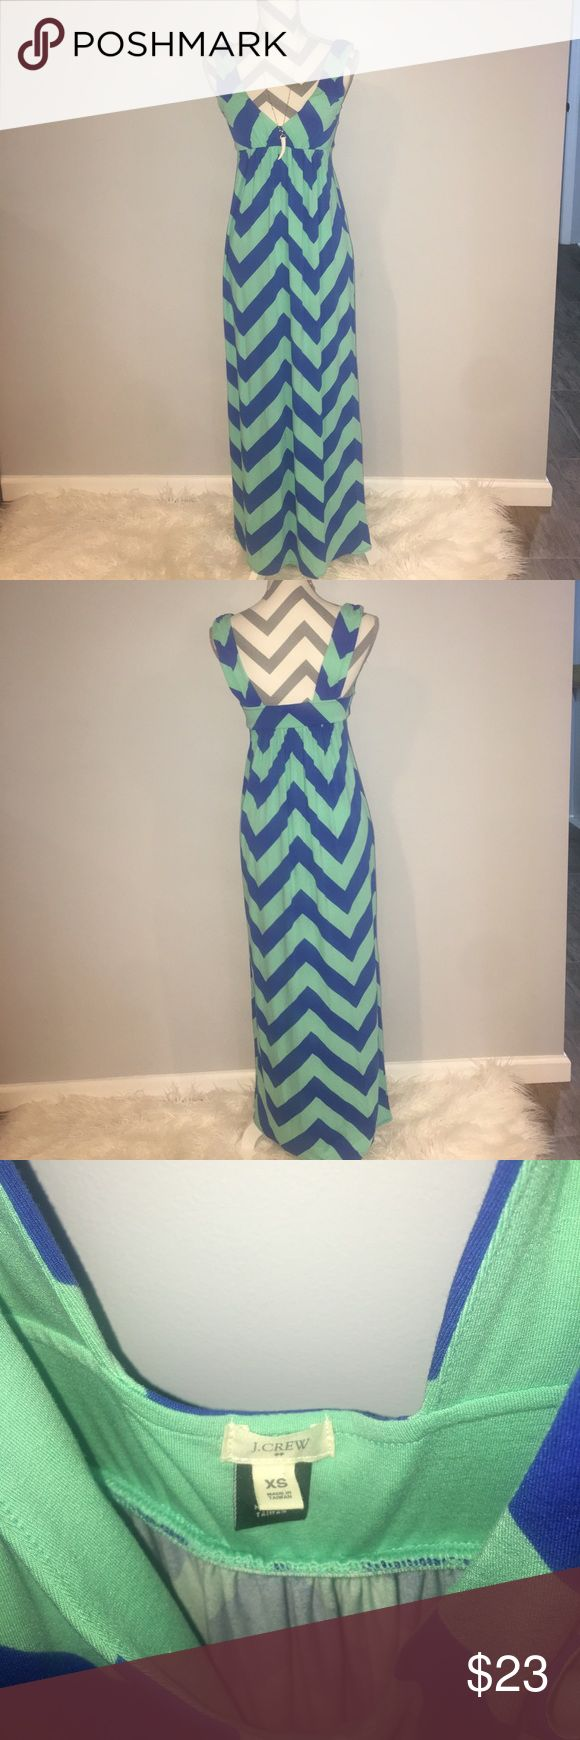 J. Crew Factory Chevron Maxi Dress EUC blue/turquoise chevron maxi dress!! Cute and super comfy! J. Crew Factory Dresses Maxi